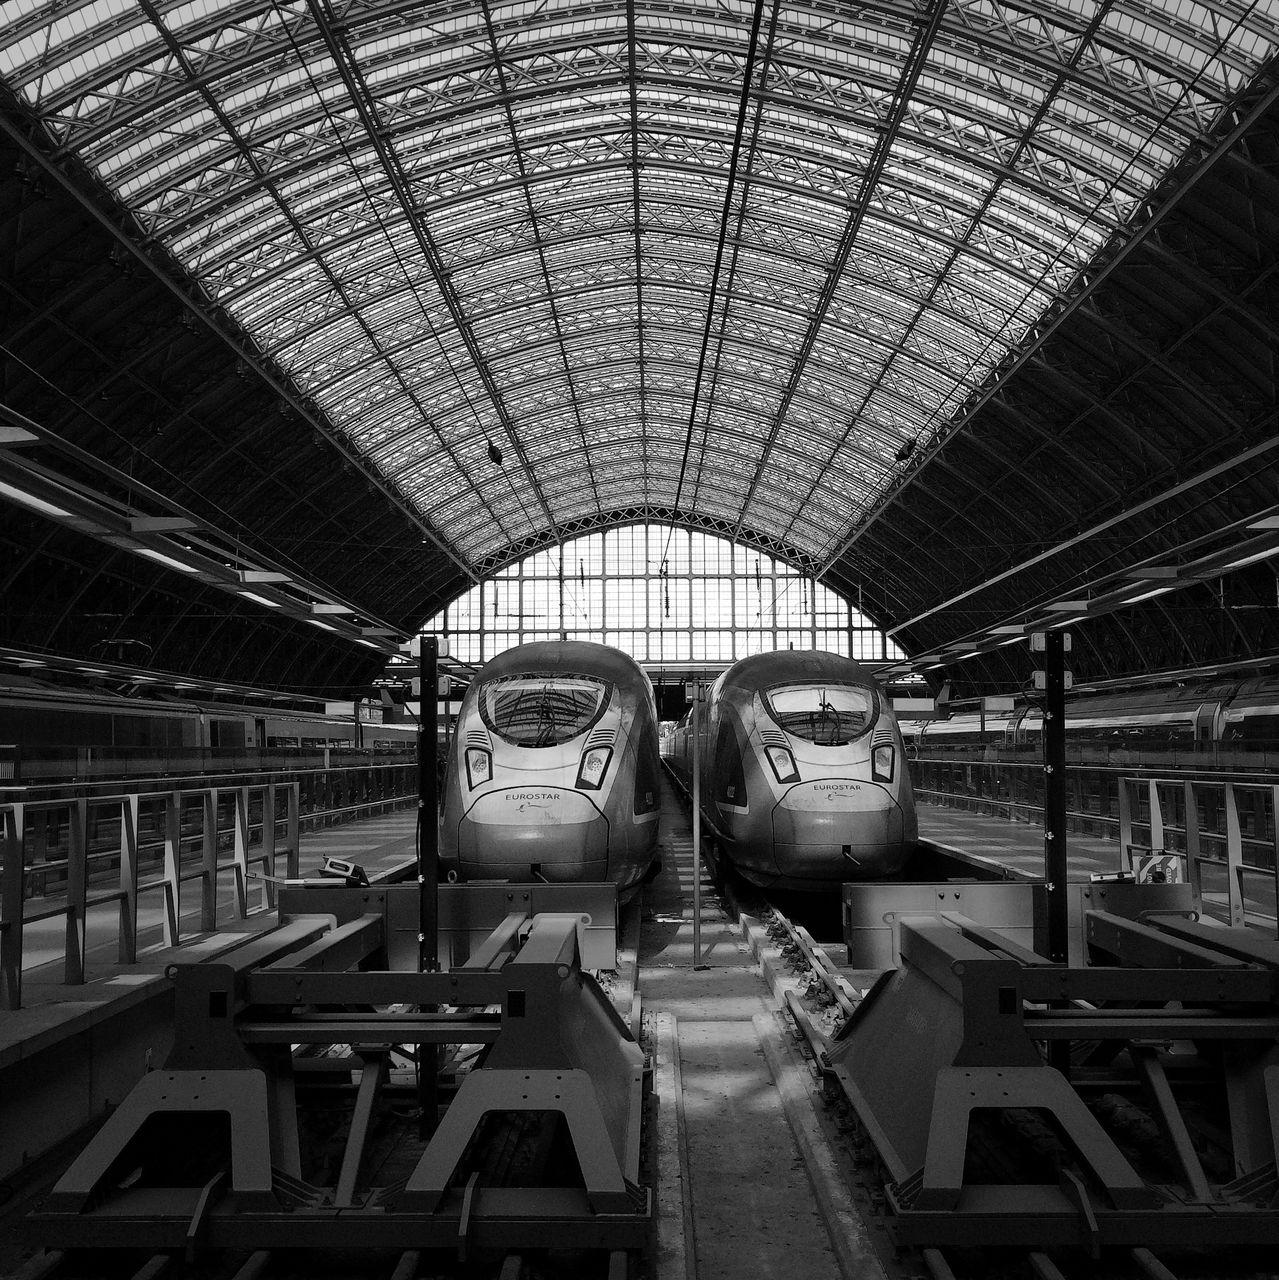 rail transportation, indoors, transportation, train - vehicle, day, no people